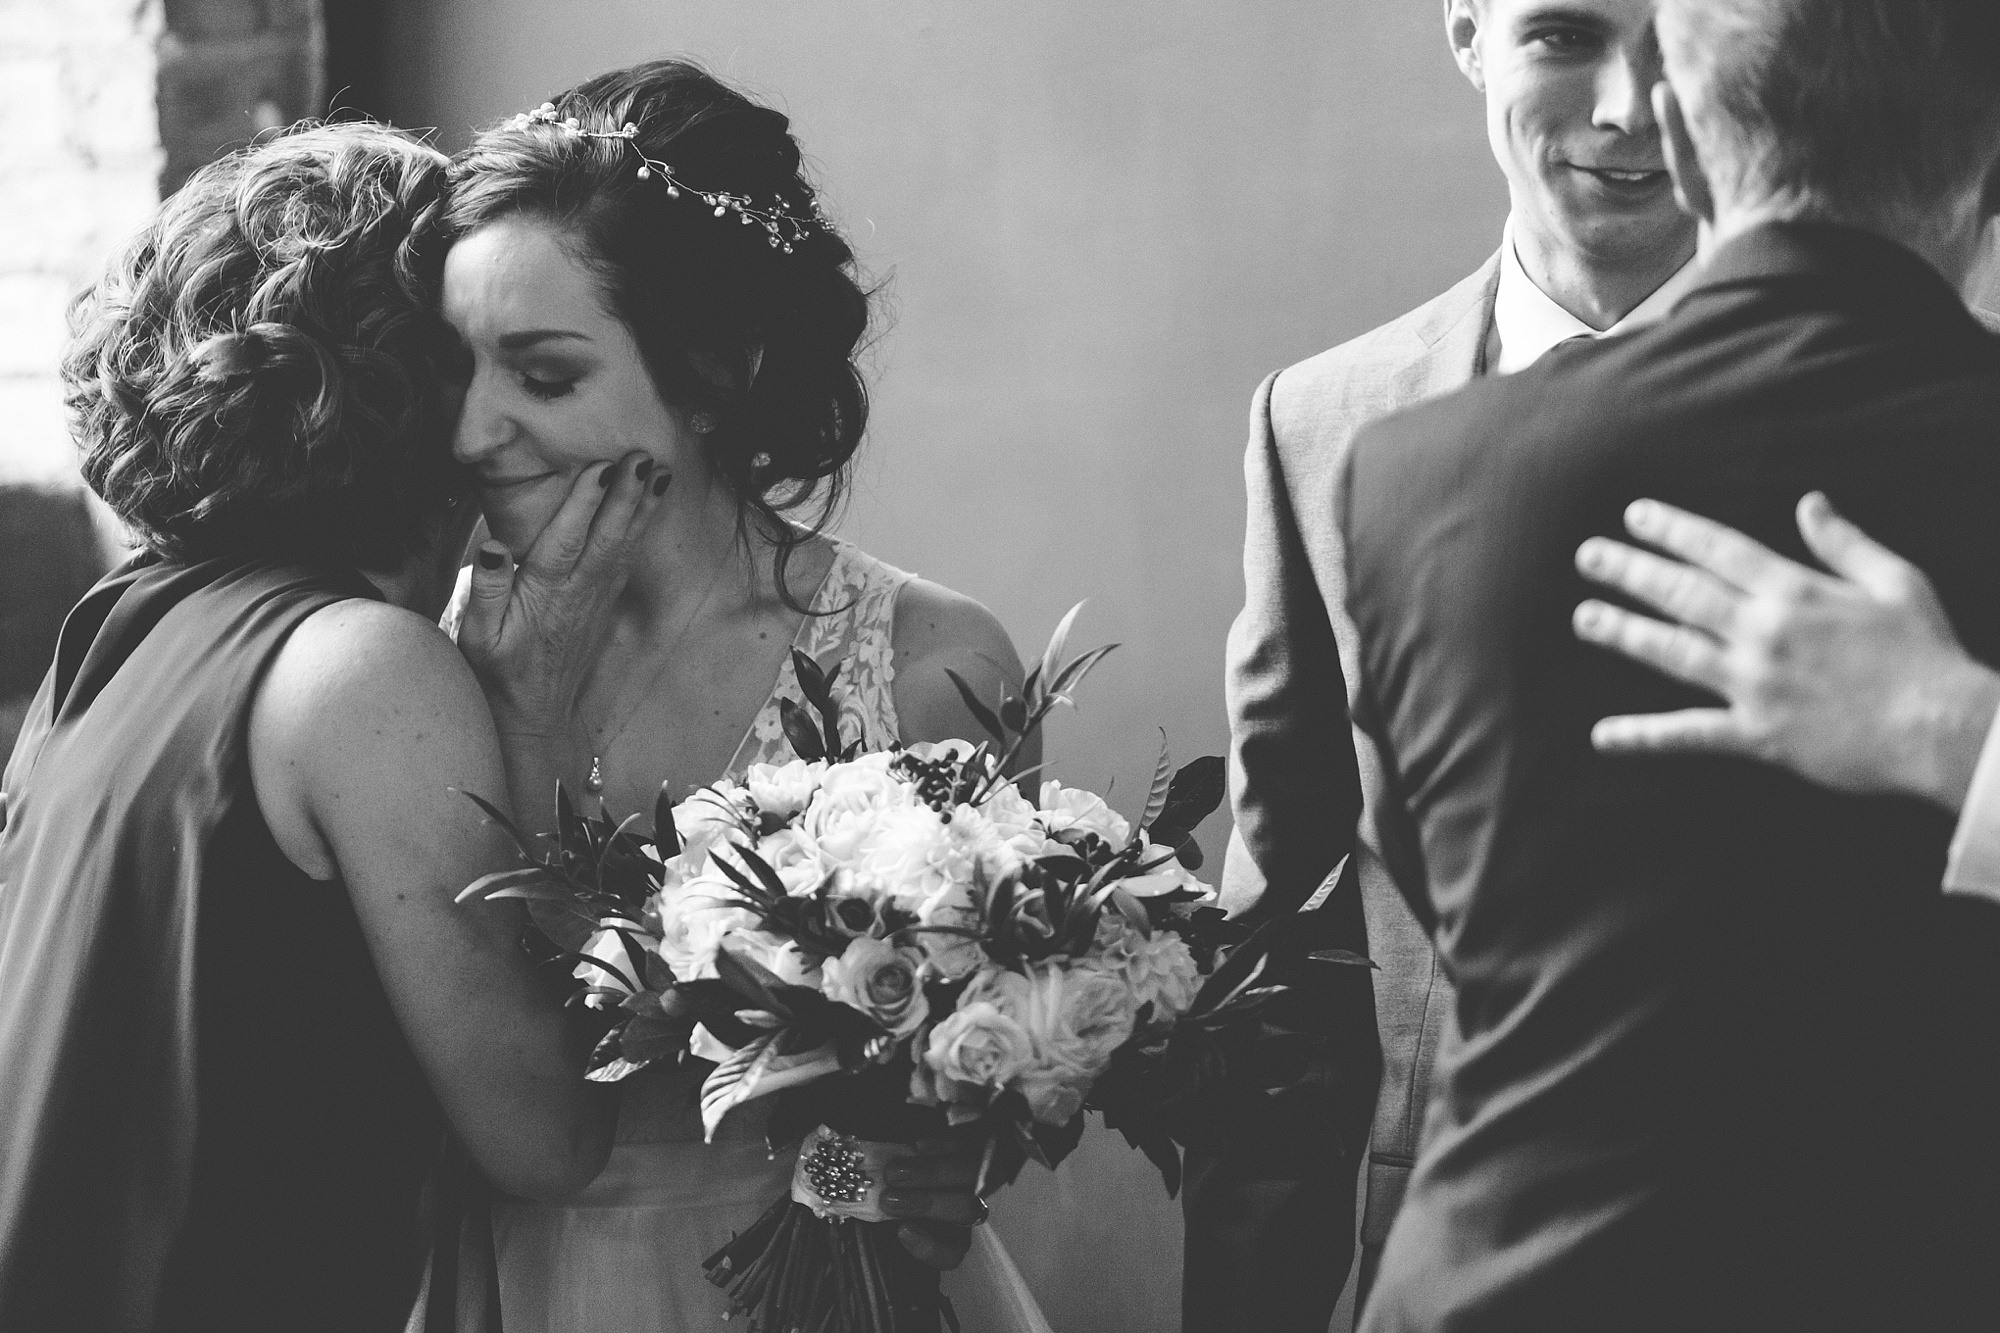 Brandon_Shafer_Photography_Lauren_Ethan_New_Vintage_Place_Grand_Rapids_Wedding_0041.jpg